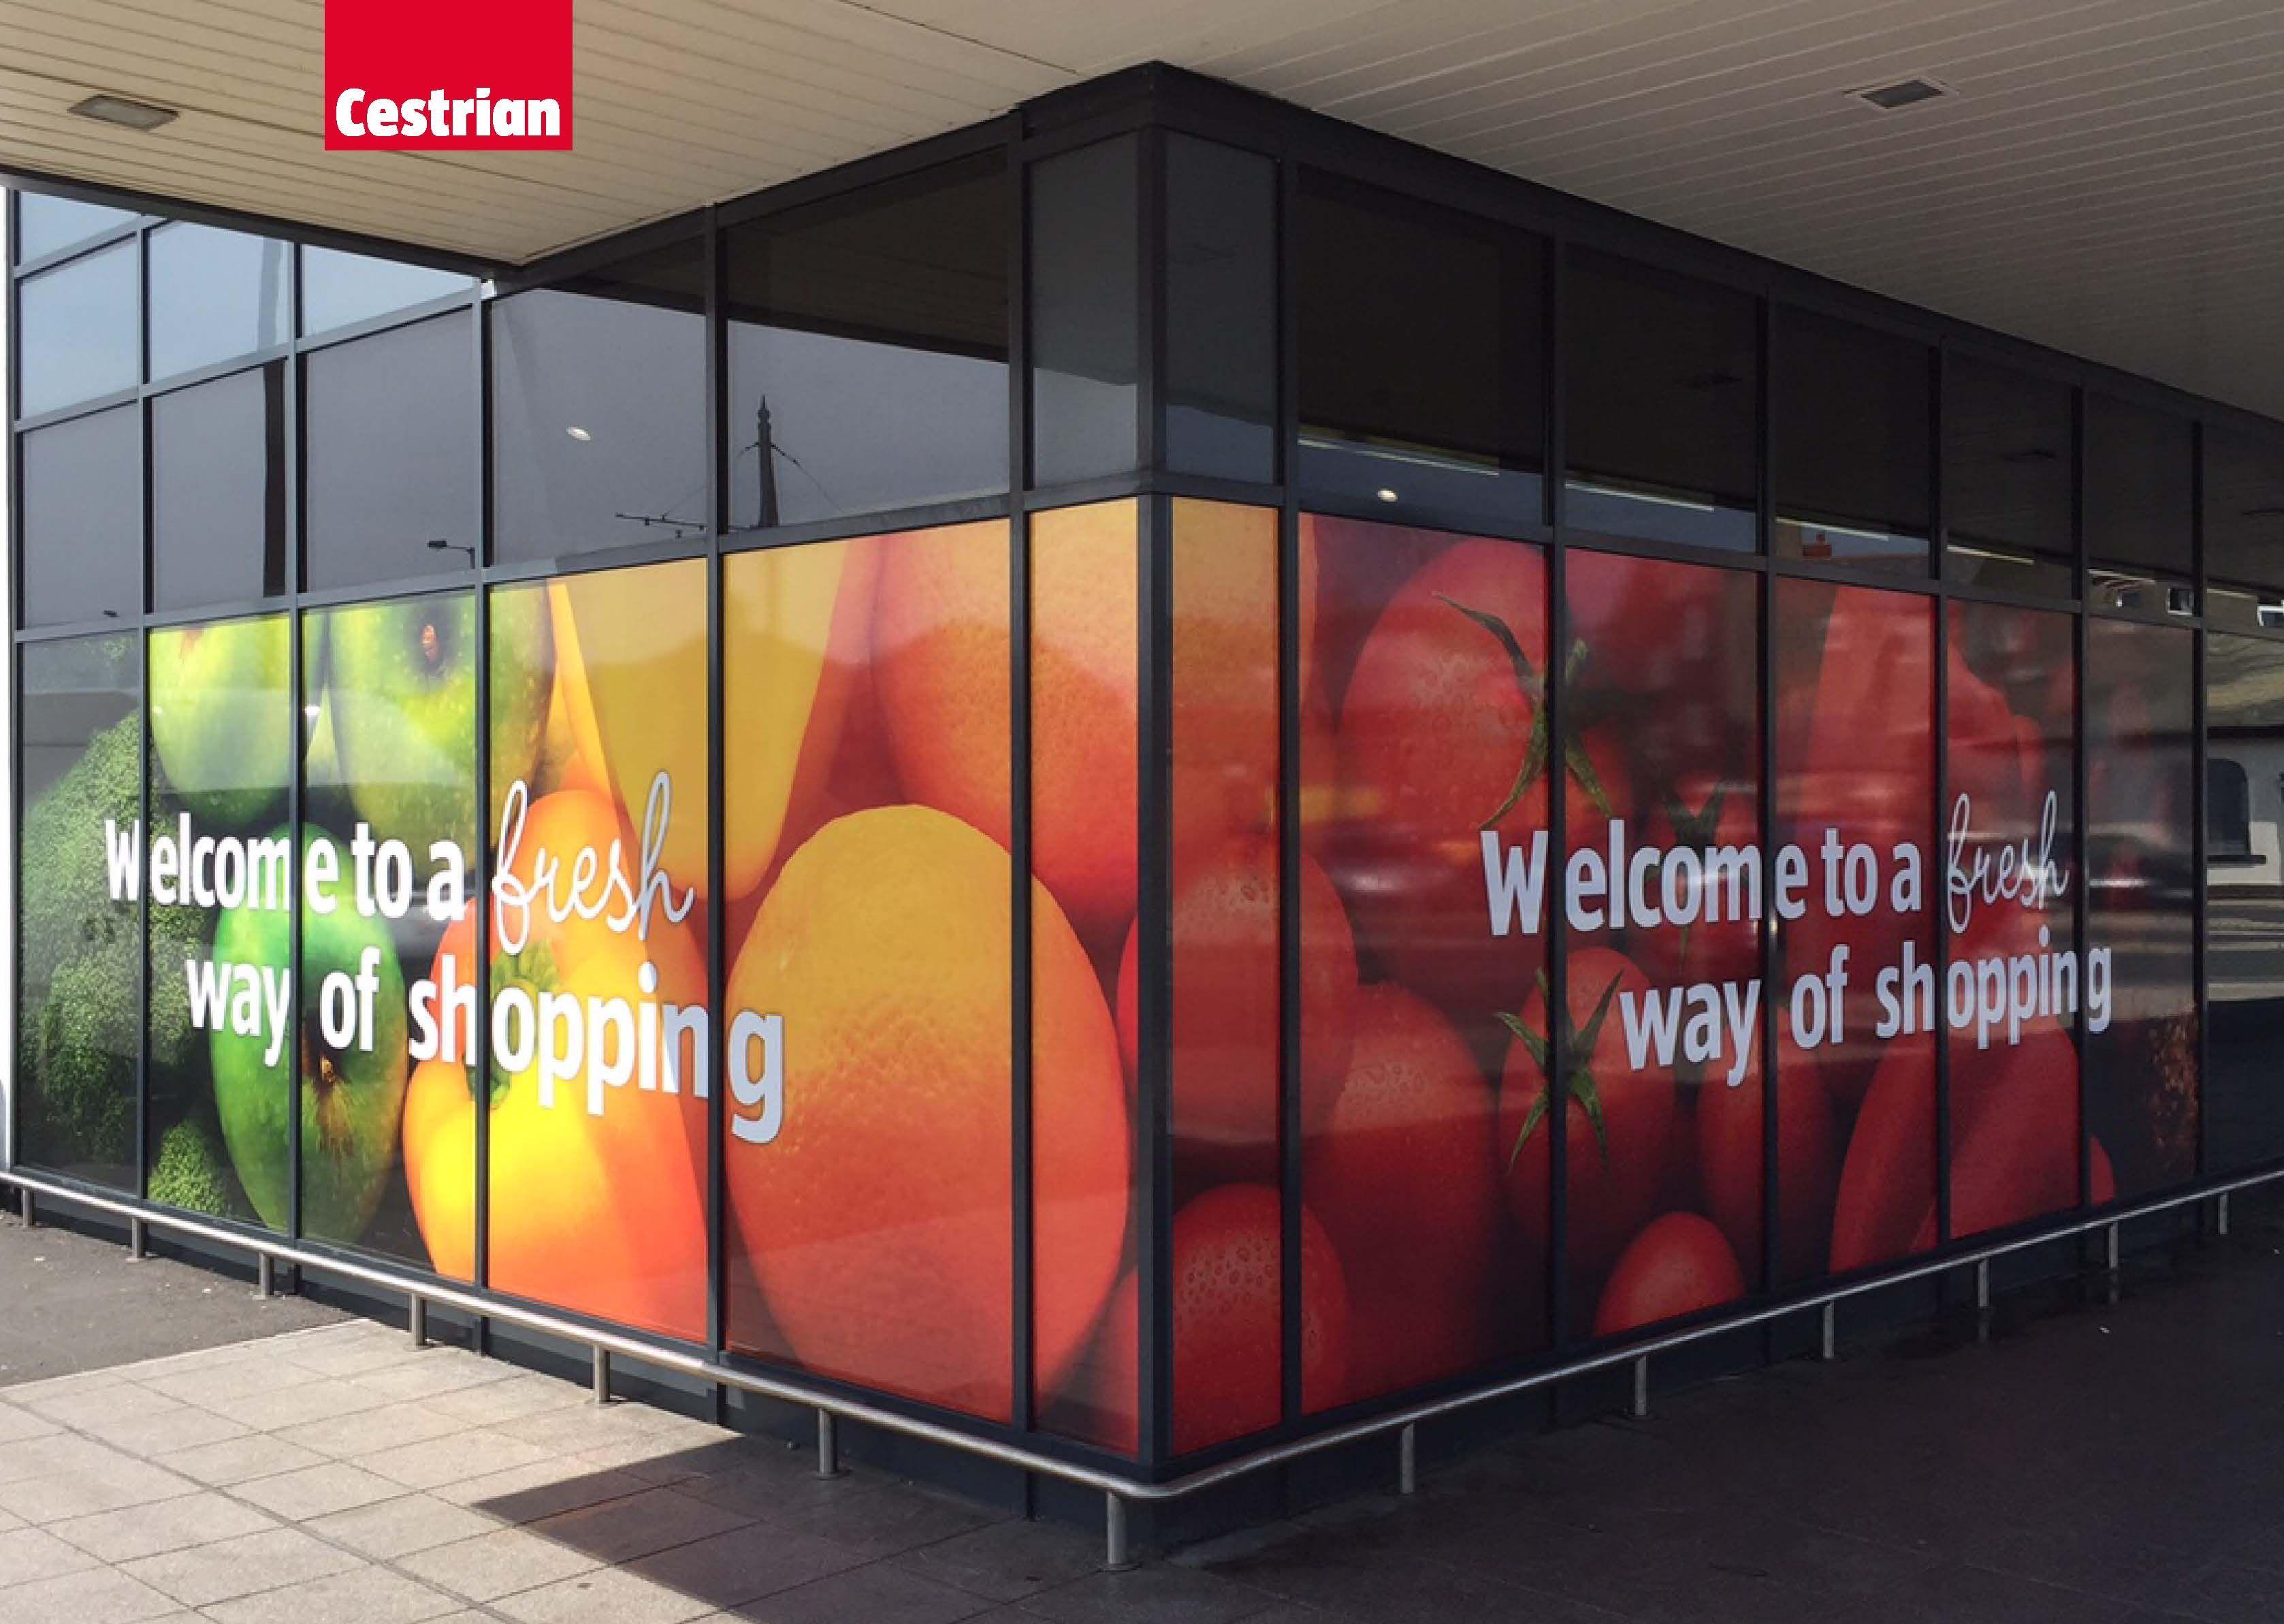 Cestrian Supply Aldi With Their Window Graphics Cestrianimaging Retailpos Windowgraphic Supermarket Design Grocery Store Design Window Graphics